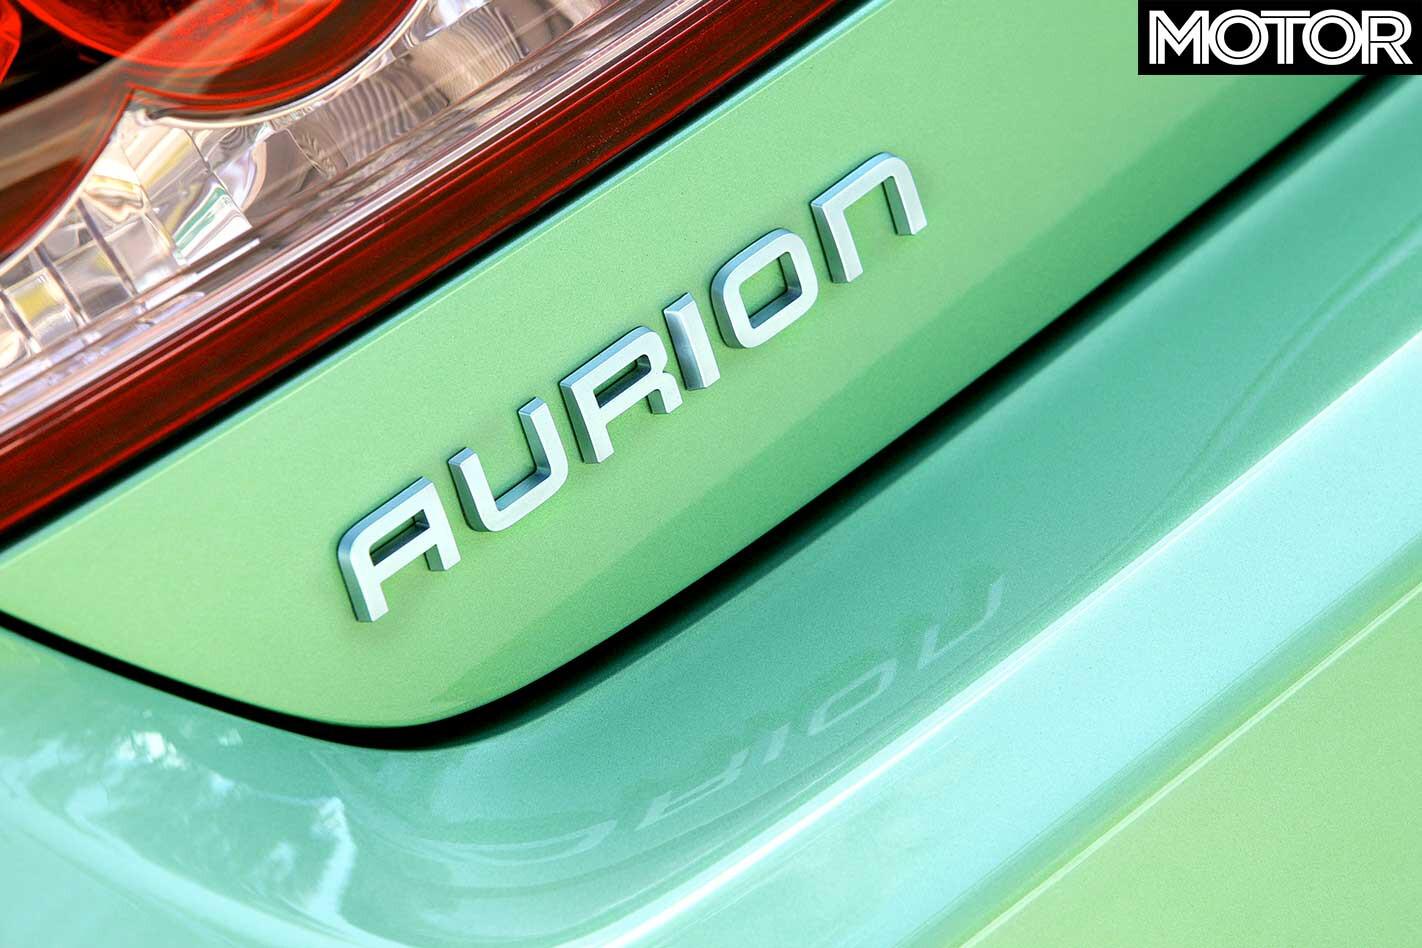 2006 Toyota Aurion Rear Badge Jpg